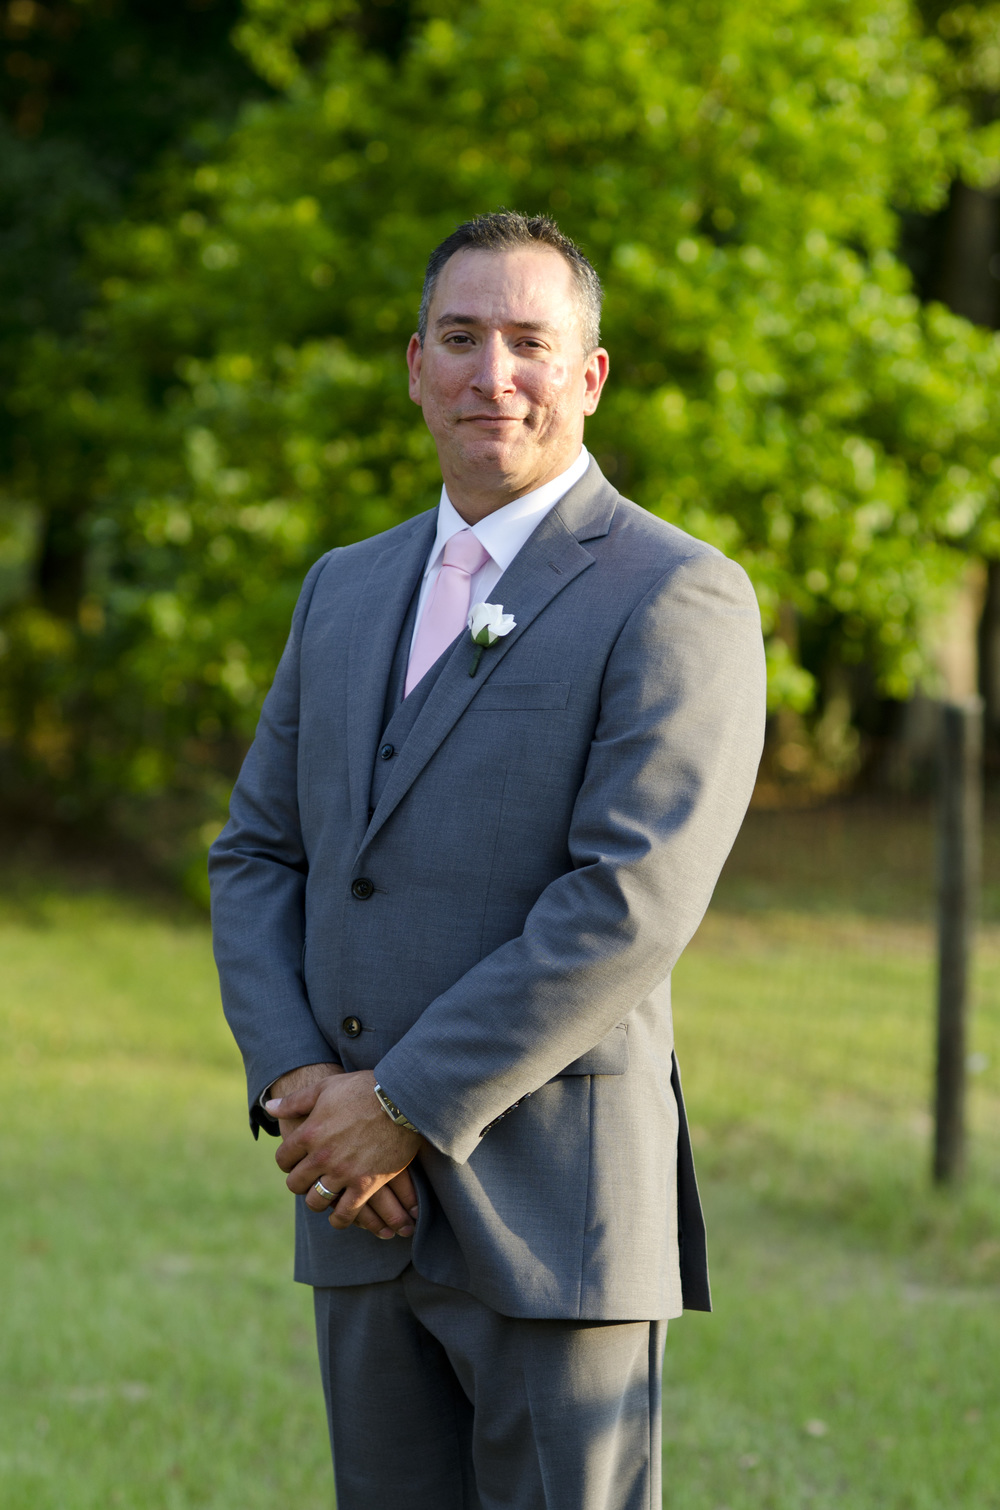 alaska wedding photographer - outdoor wedding